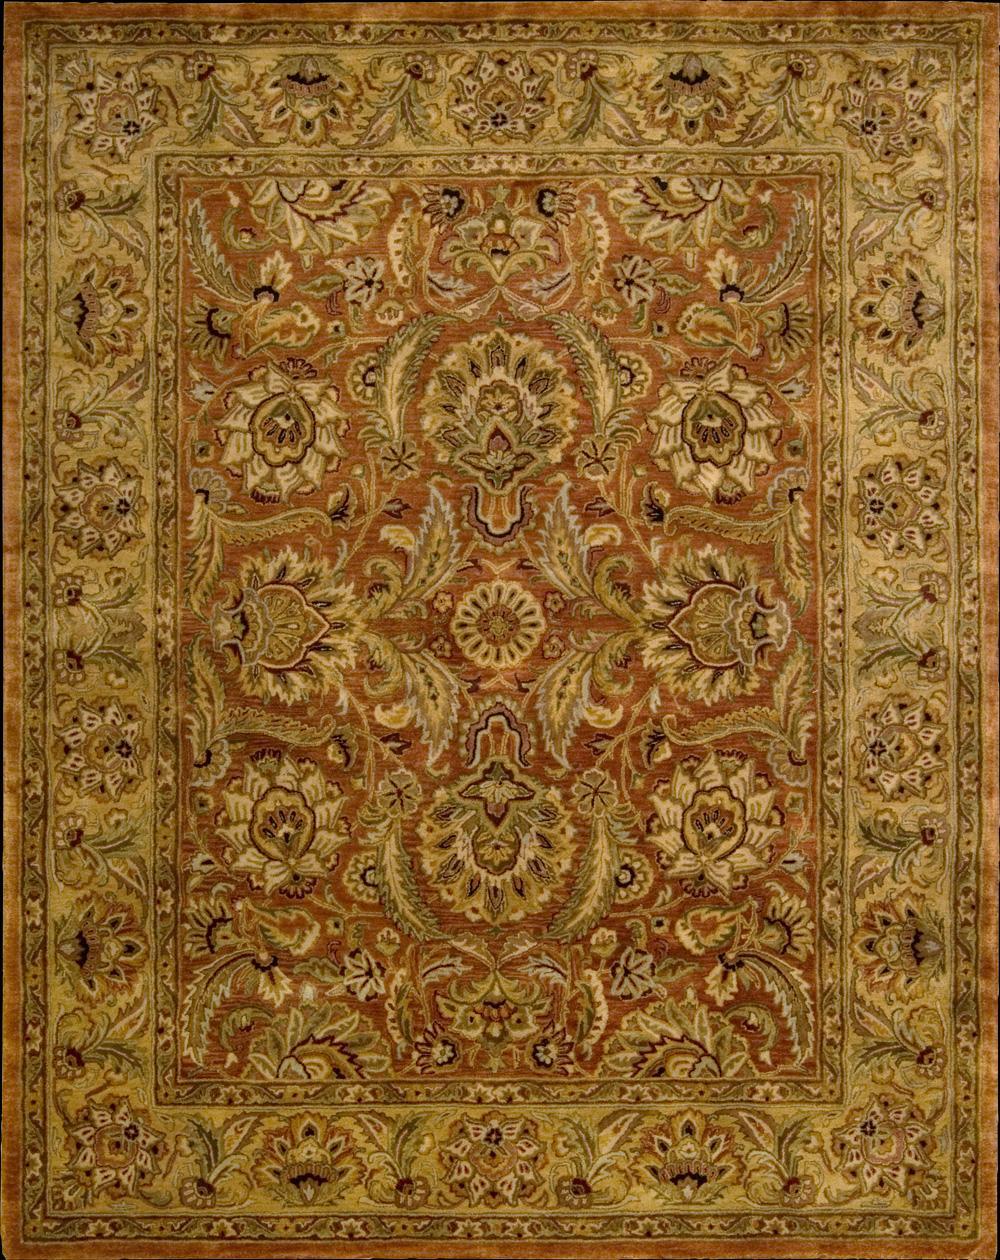 "Nourison Jaipur Area Rug 9'6"" x 13'6"" - Item Number: 77053"